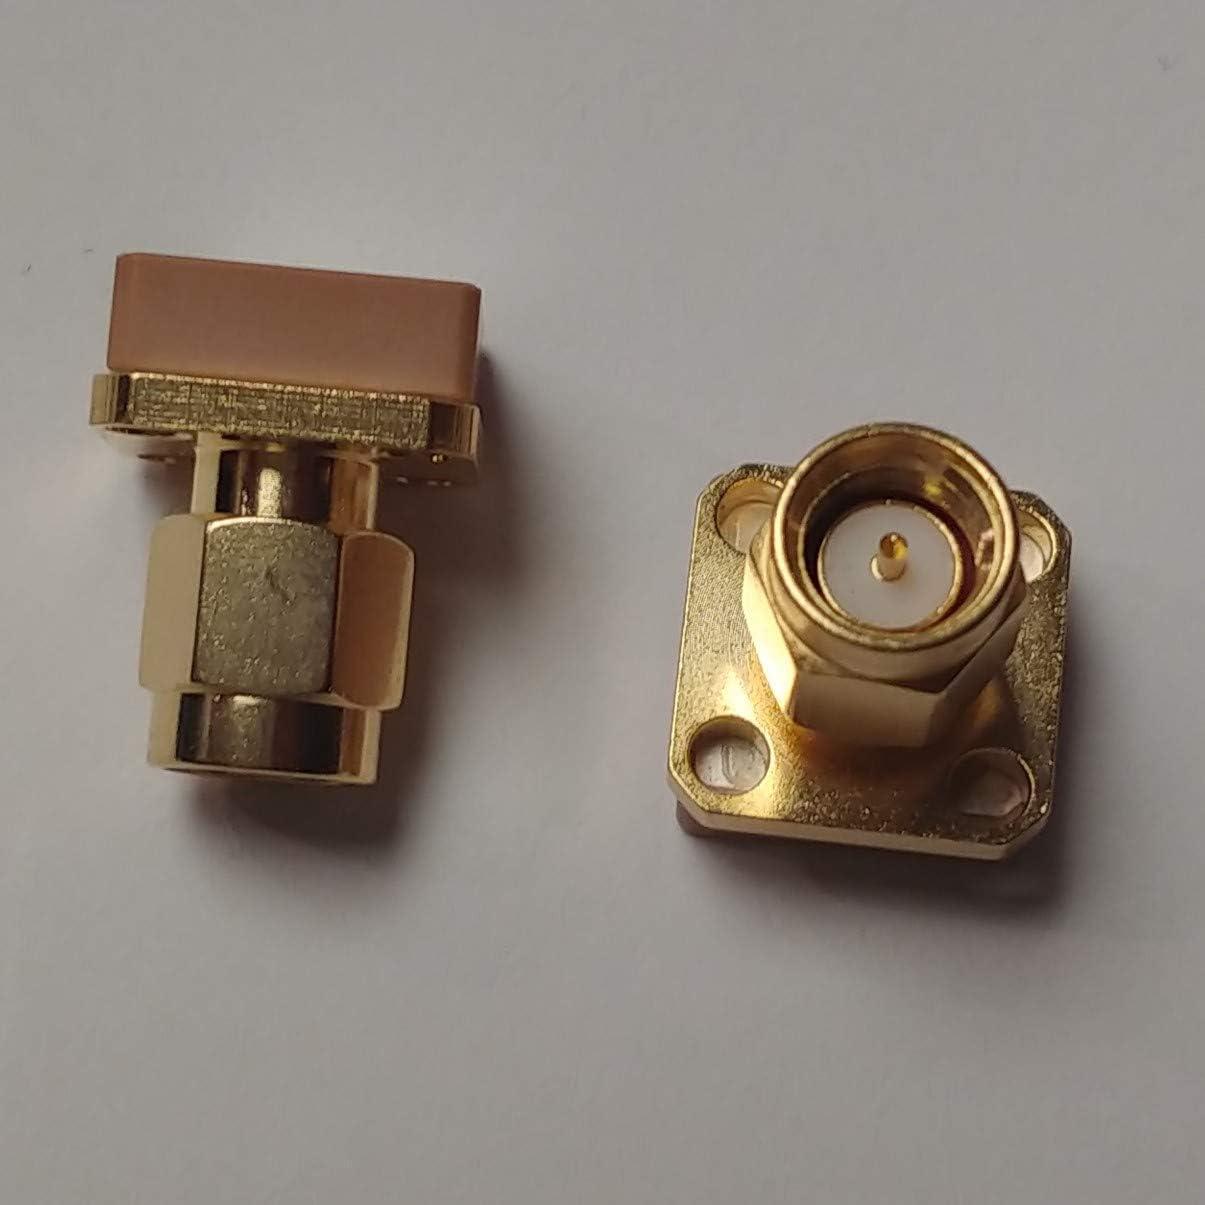 HZLabs Mini GPS Antenna 1575MHz,Covert//Tracking 2 Pack Bulkhead Mount Male SMA